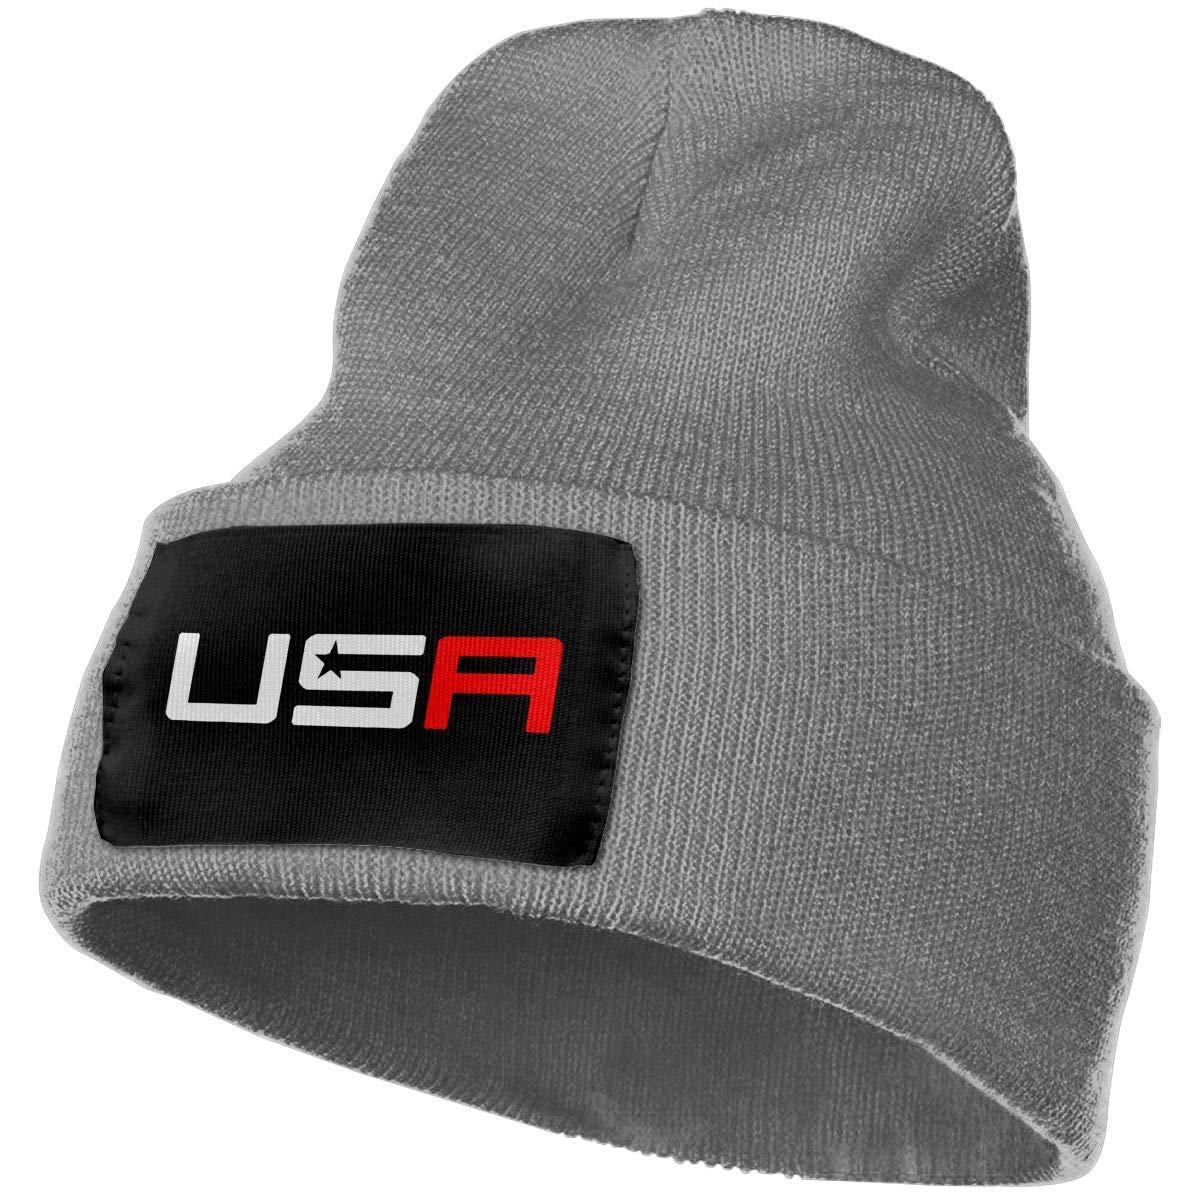 3b49cc709 Unisex Winter Hats USA Ryder Cup Golf Logo College Skull Caps Knit ...